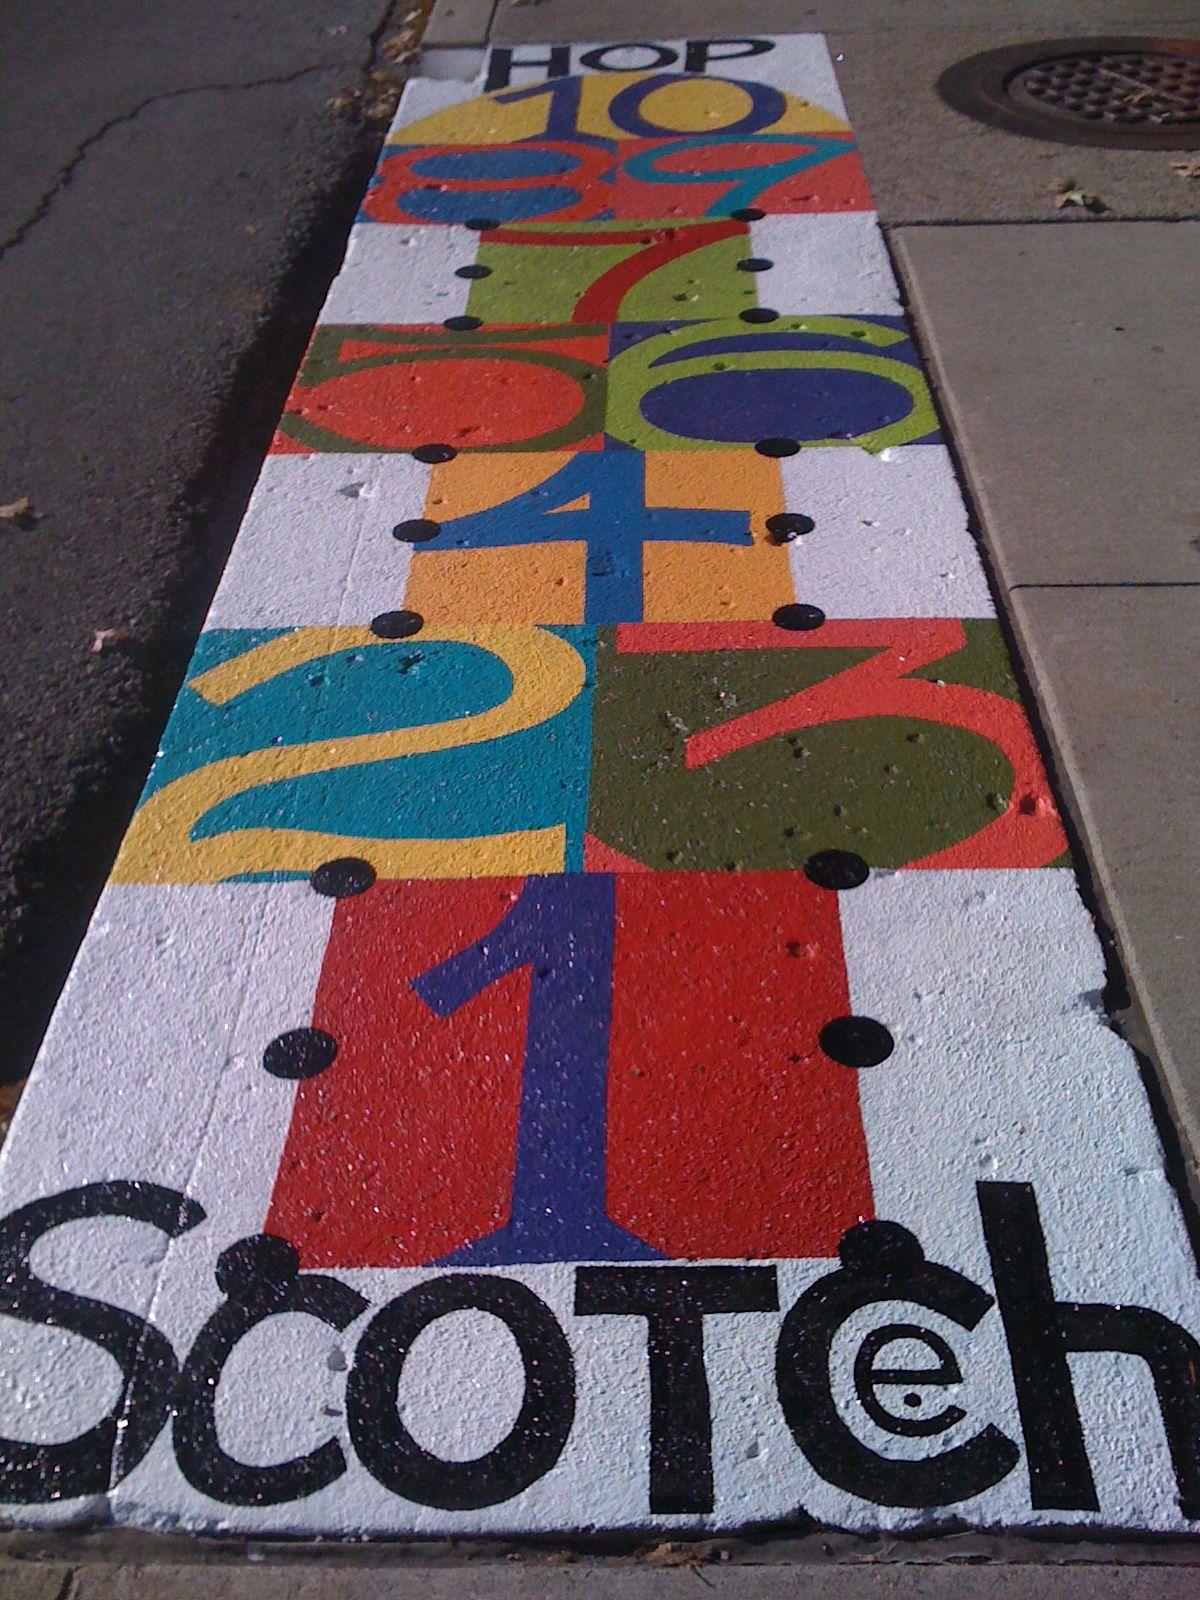 made you look storm drain public art project Hopscotch